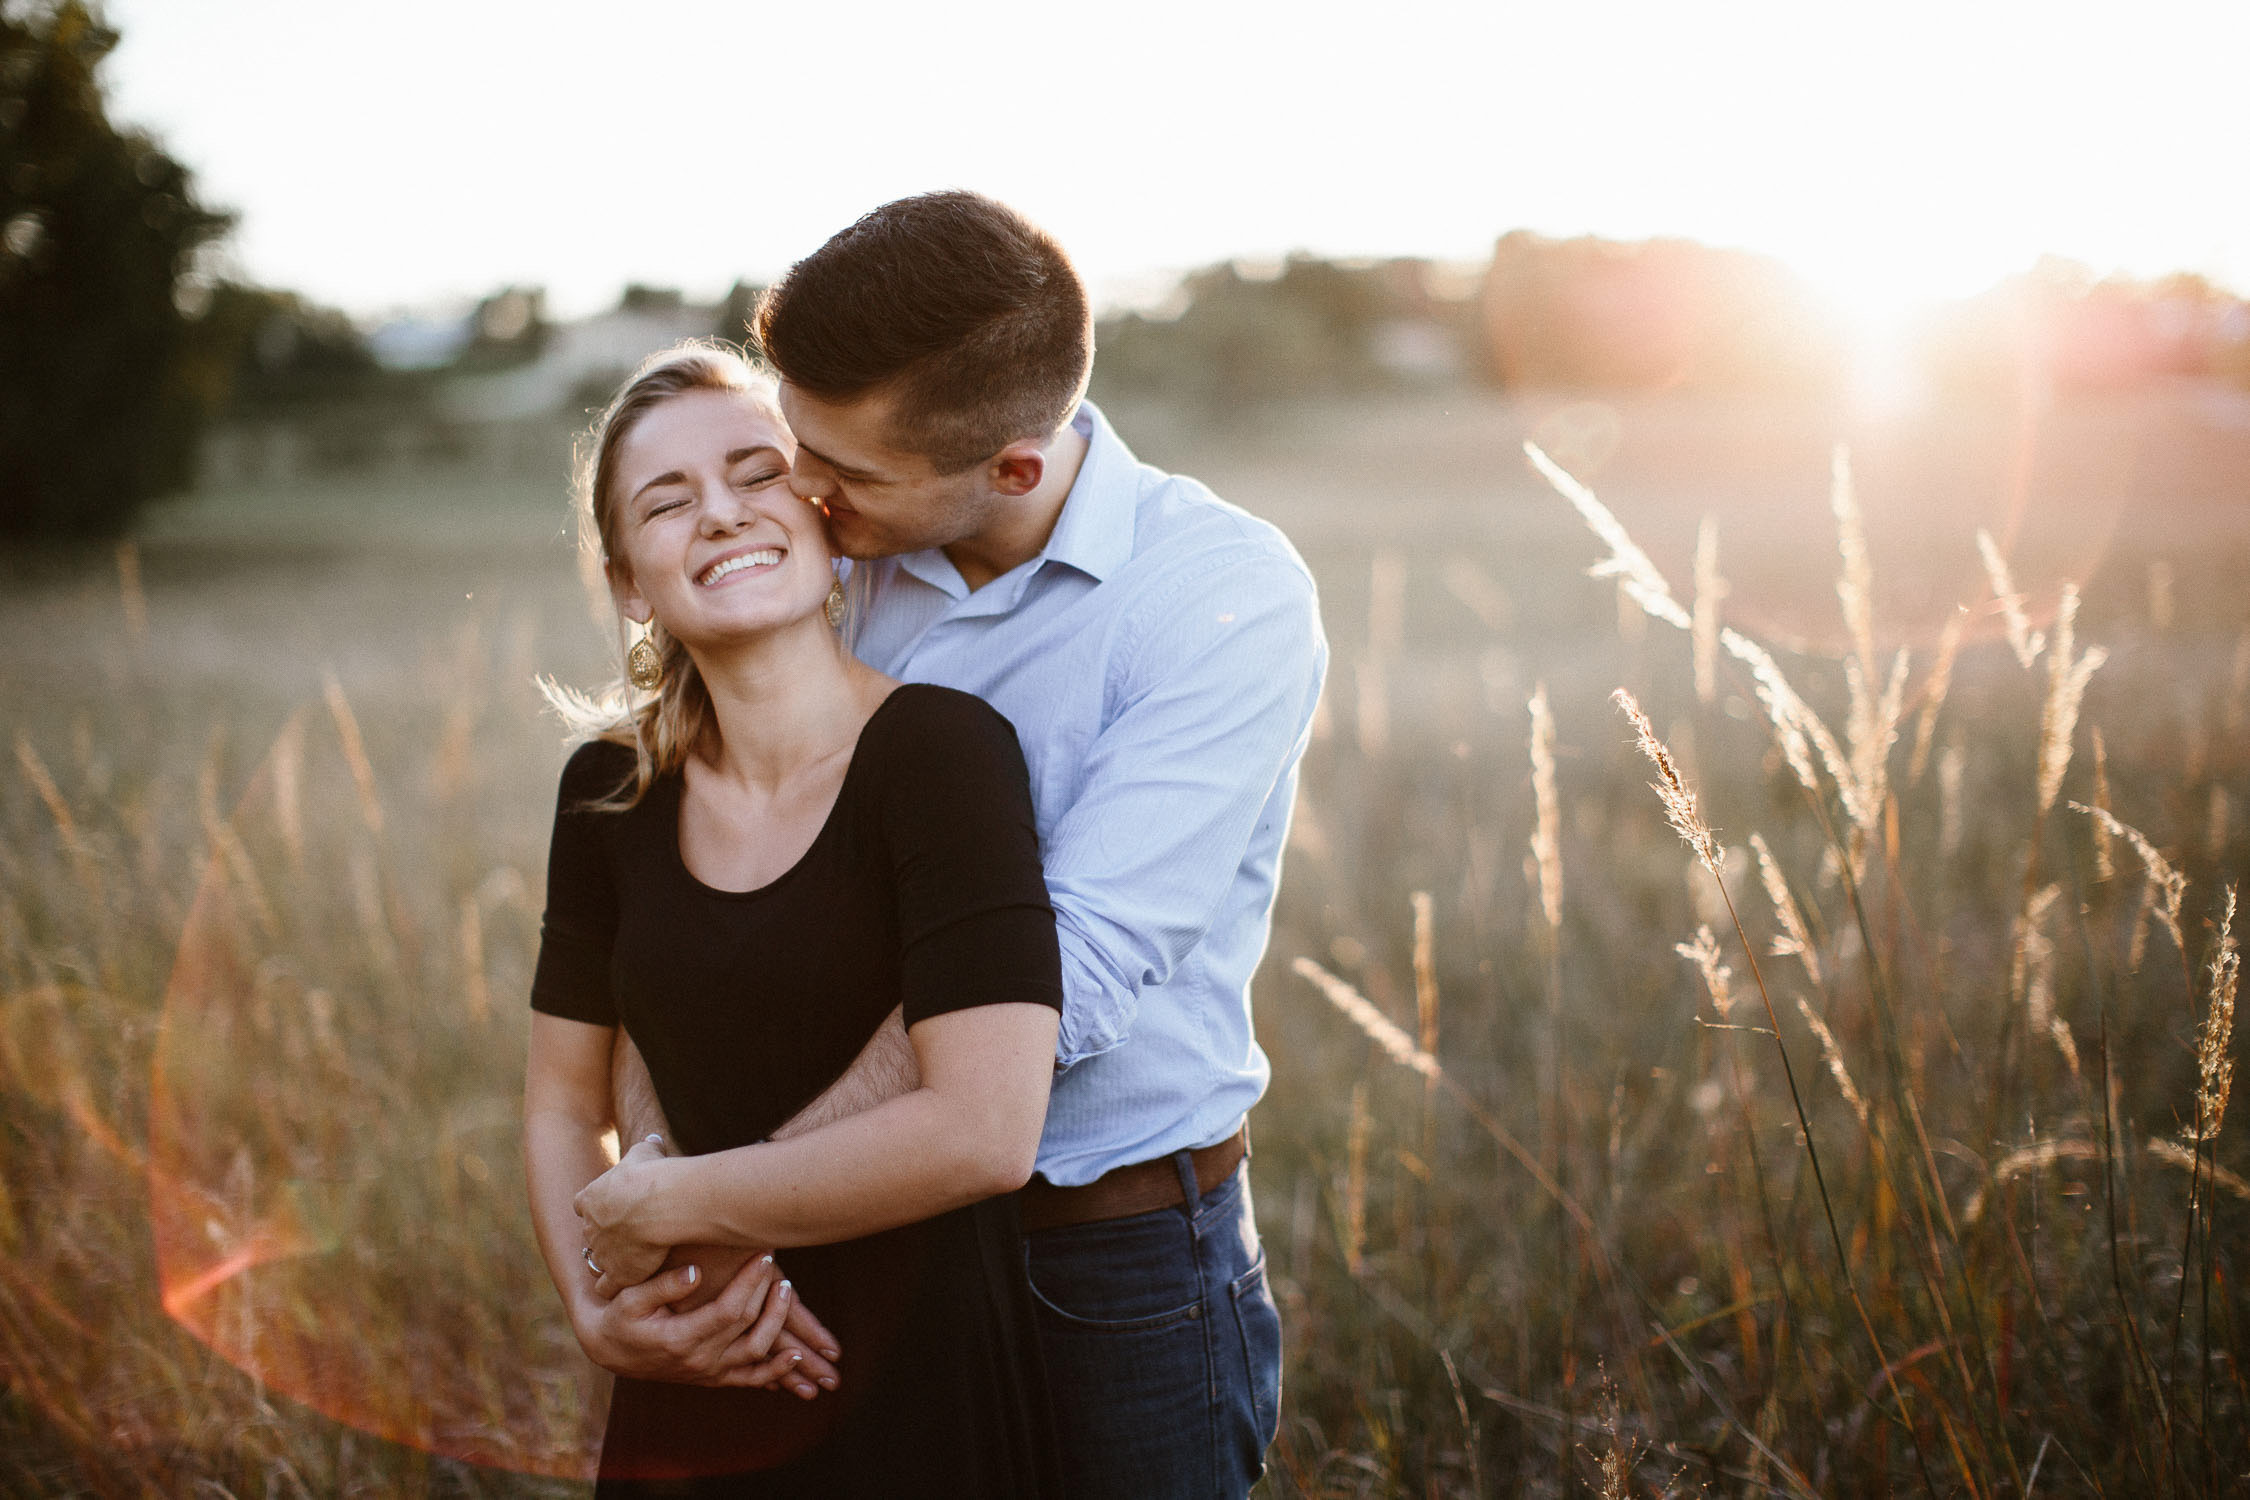 Romantic_Timeless_Downtown_SiouxFalls_Engagement_Wedding_Photographer_57.jpg